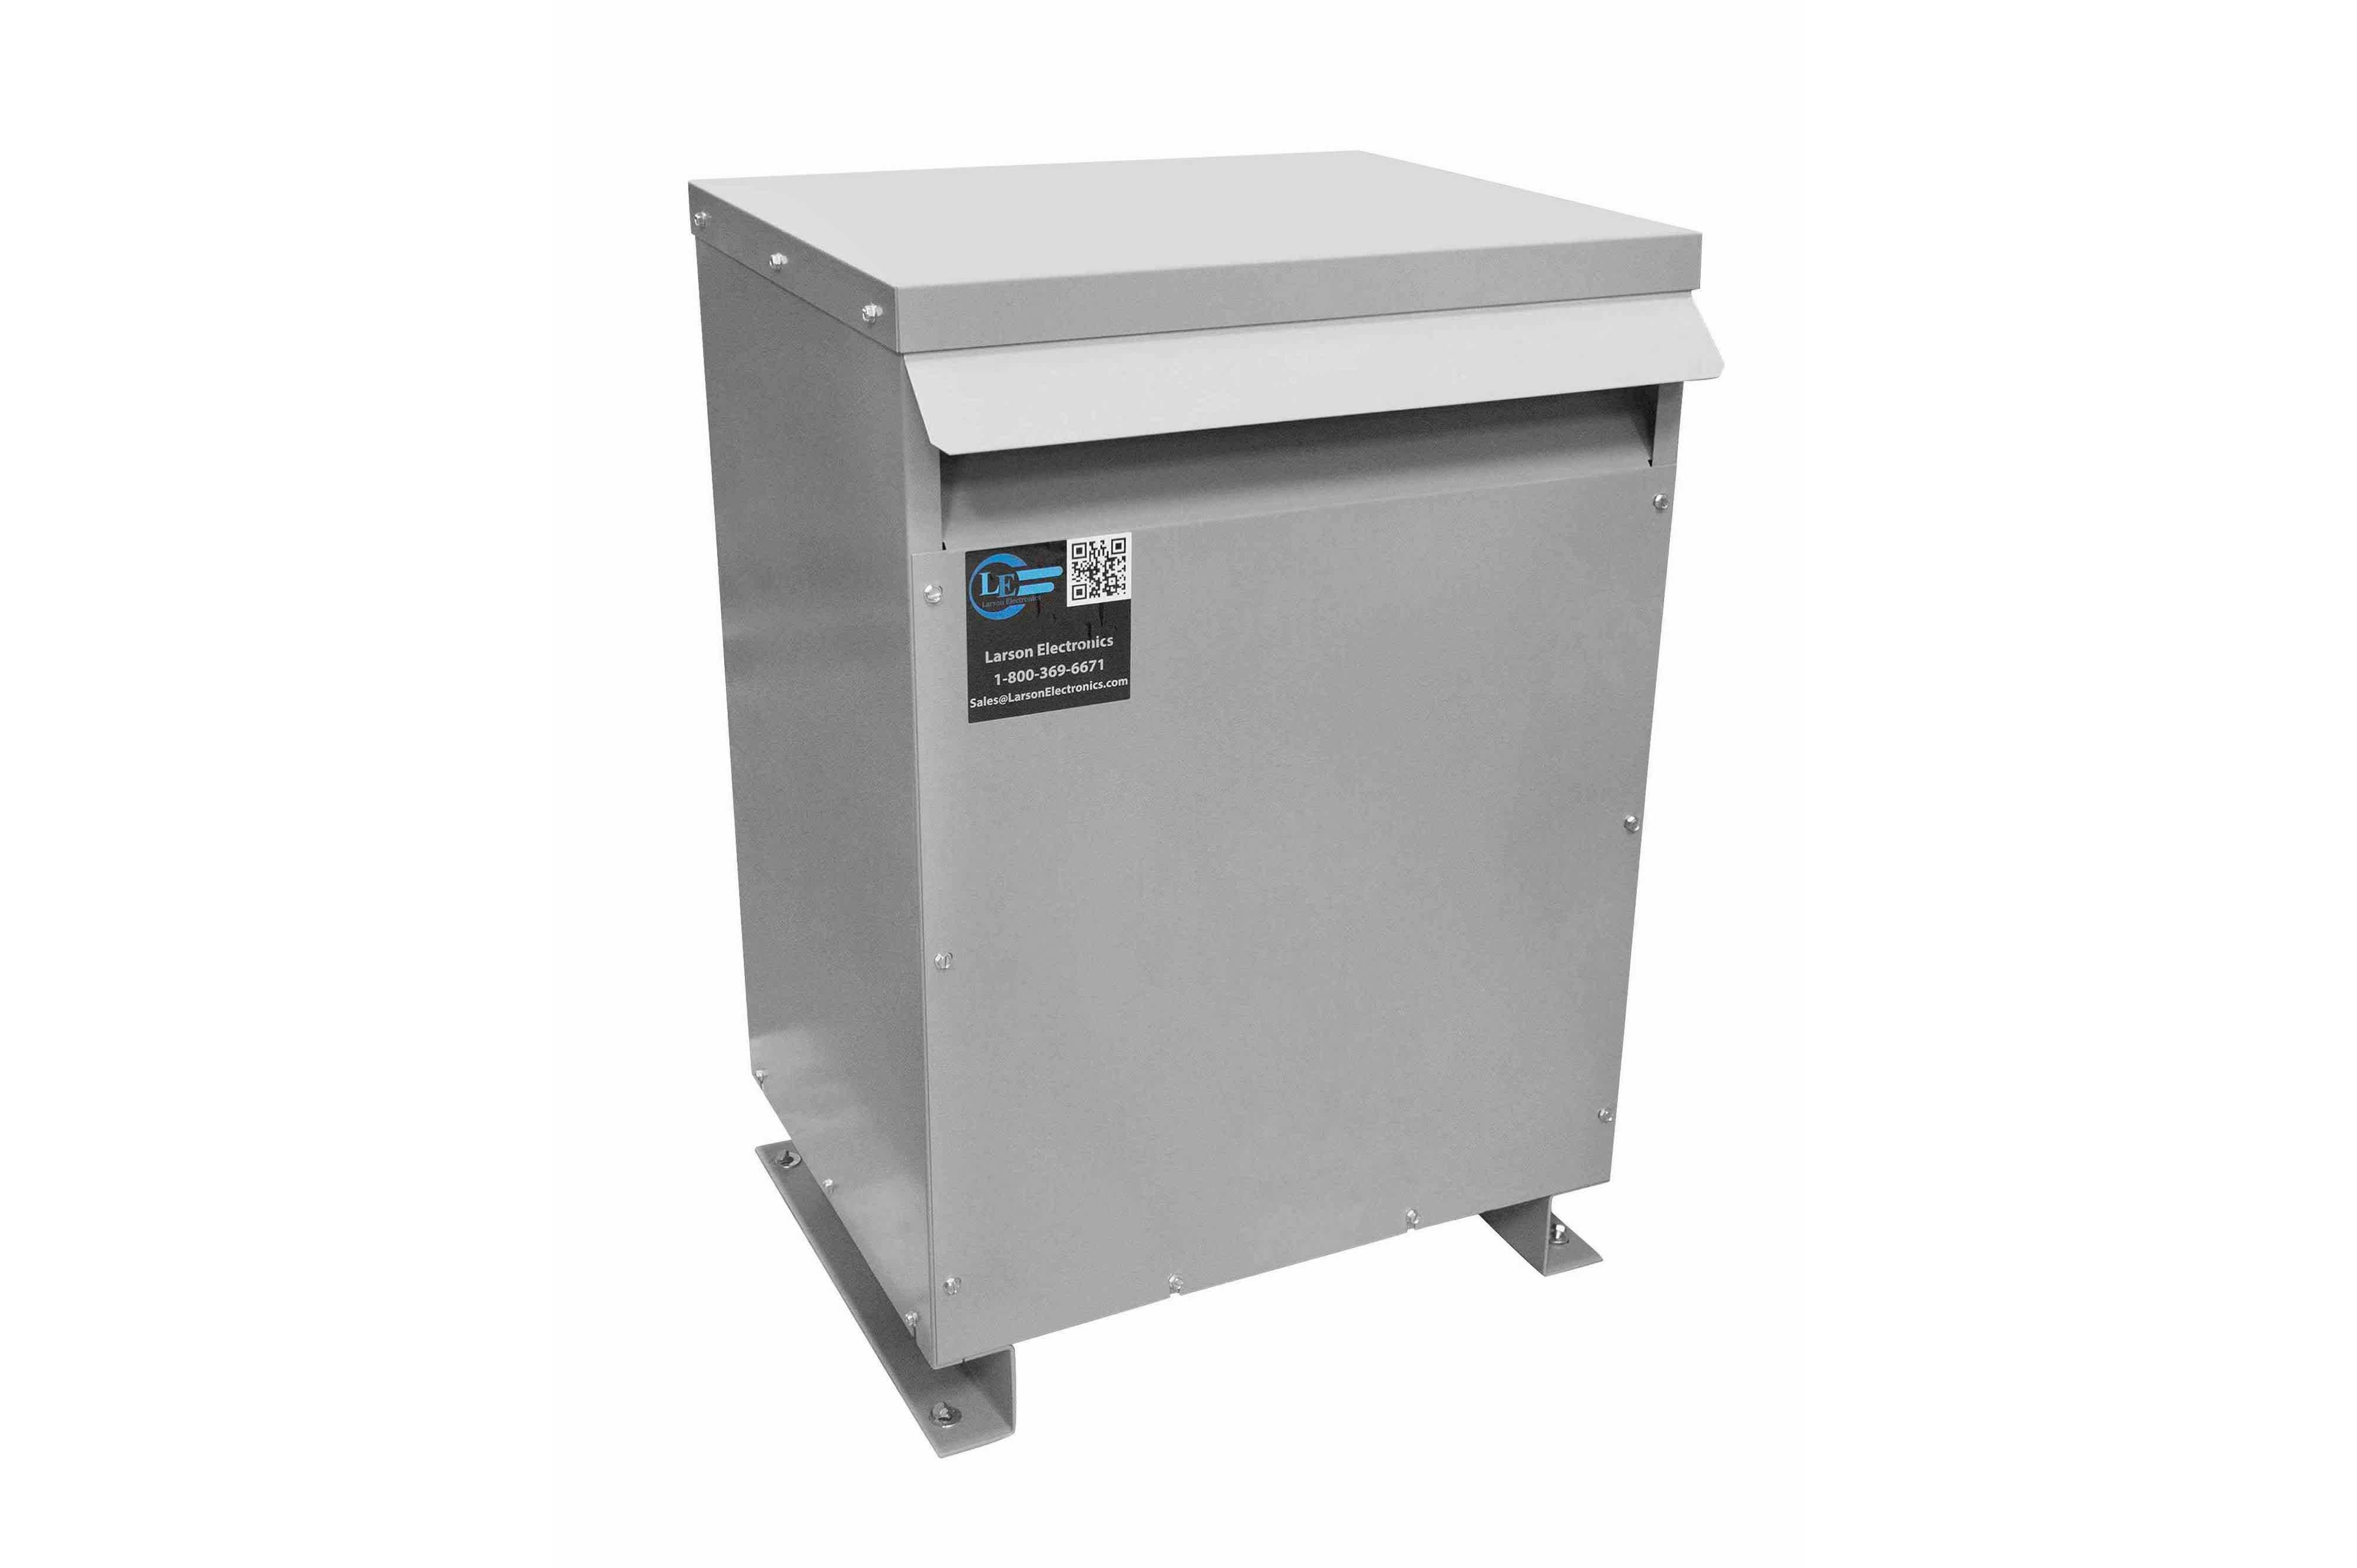 12 kVA 3PH Isolation Transformer, 415V Wye Primary, 600V Delta Secondary, N3R, Ventilated, 60 Hz